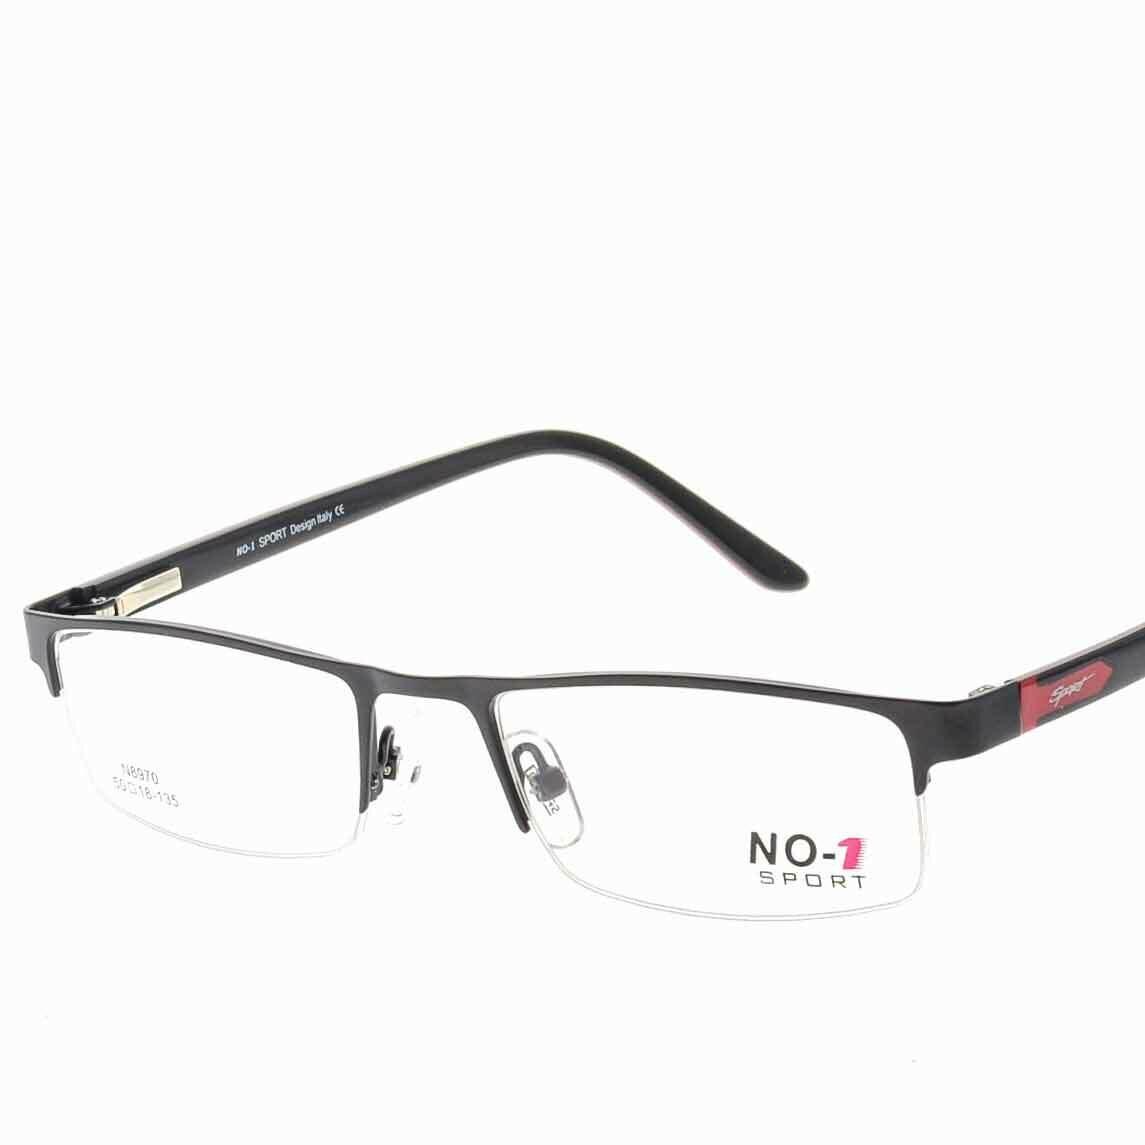 NO-1 SPORT N8970